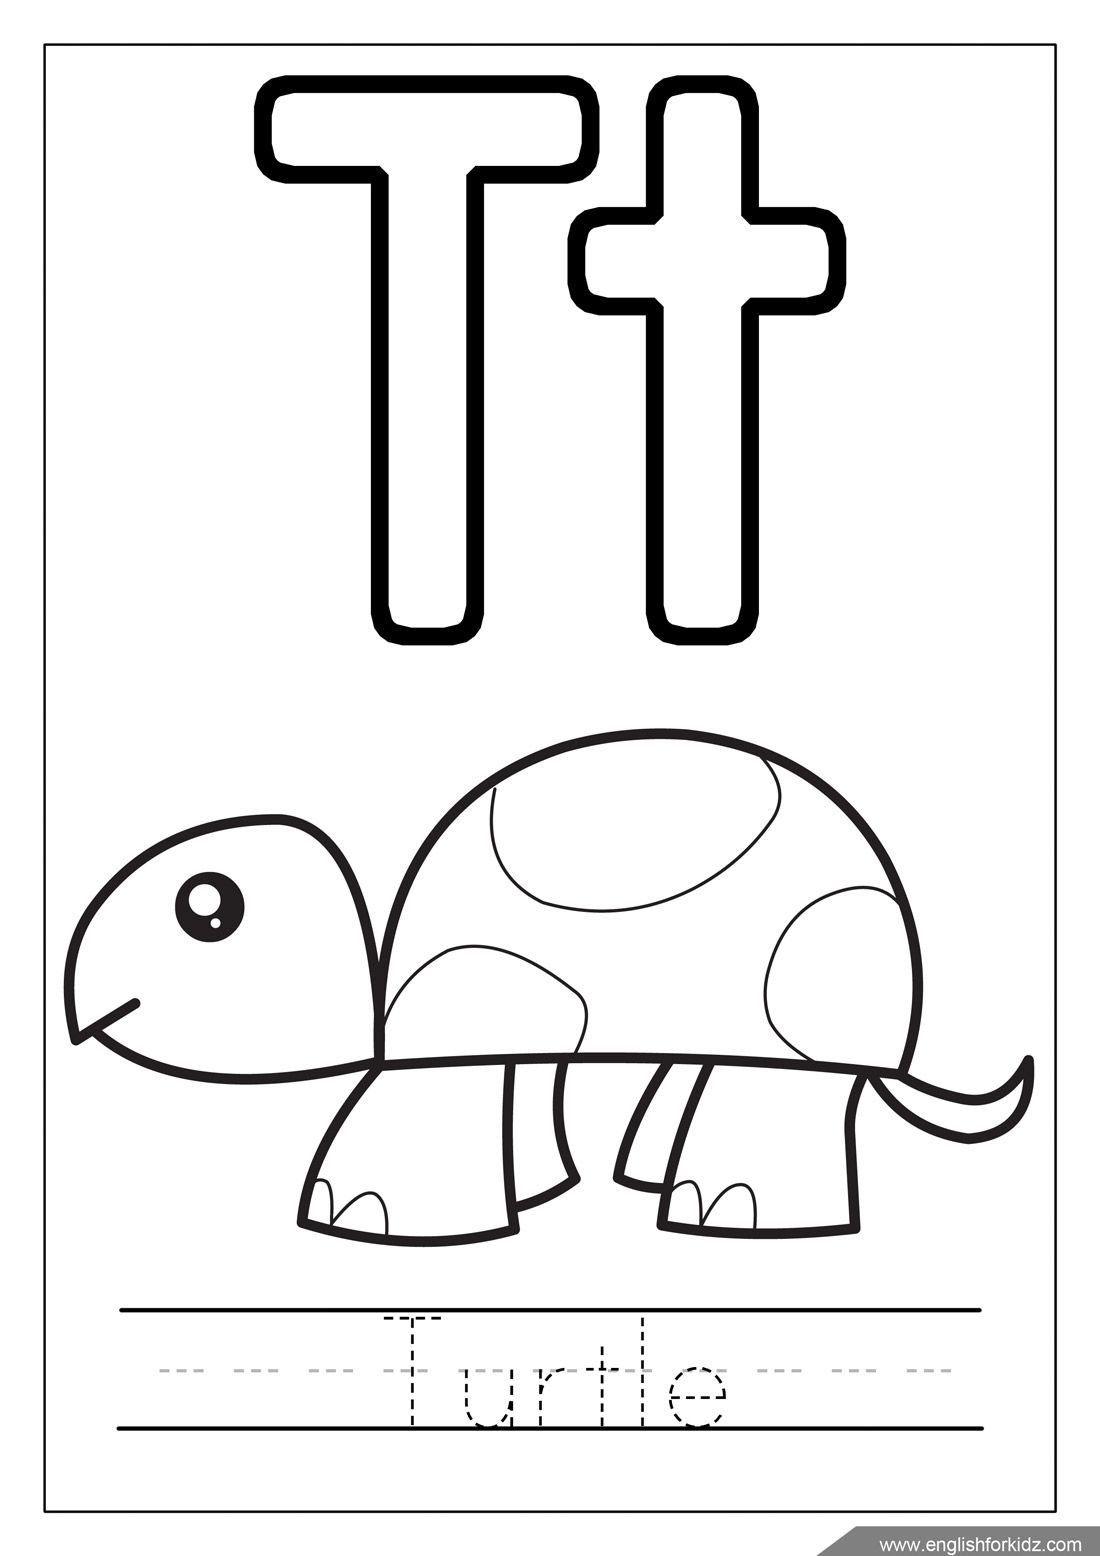 English Alphabet Coloring Page Alphabet Coloring Pages Alphabet Coloring Abc Coloring Pages [ 1556 x 1100 Pixel ]